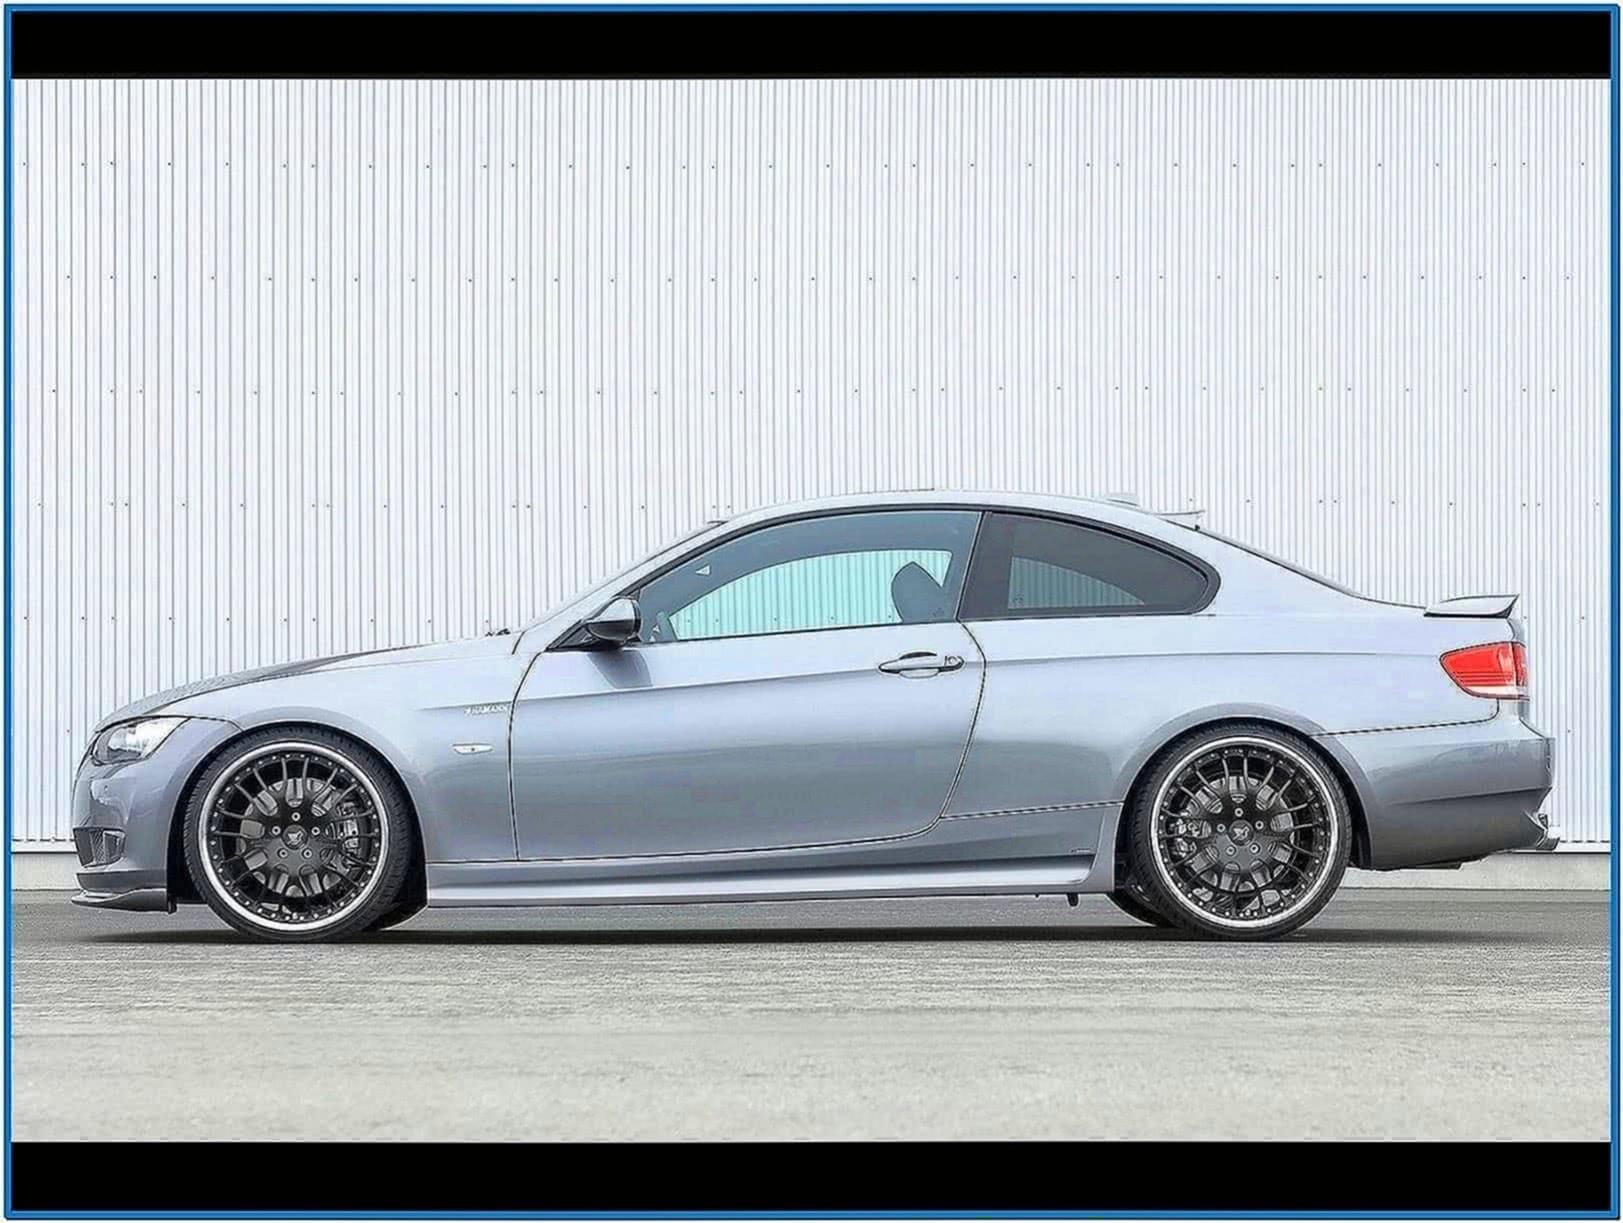 BMW 3 Series Coupe Screensaver